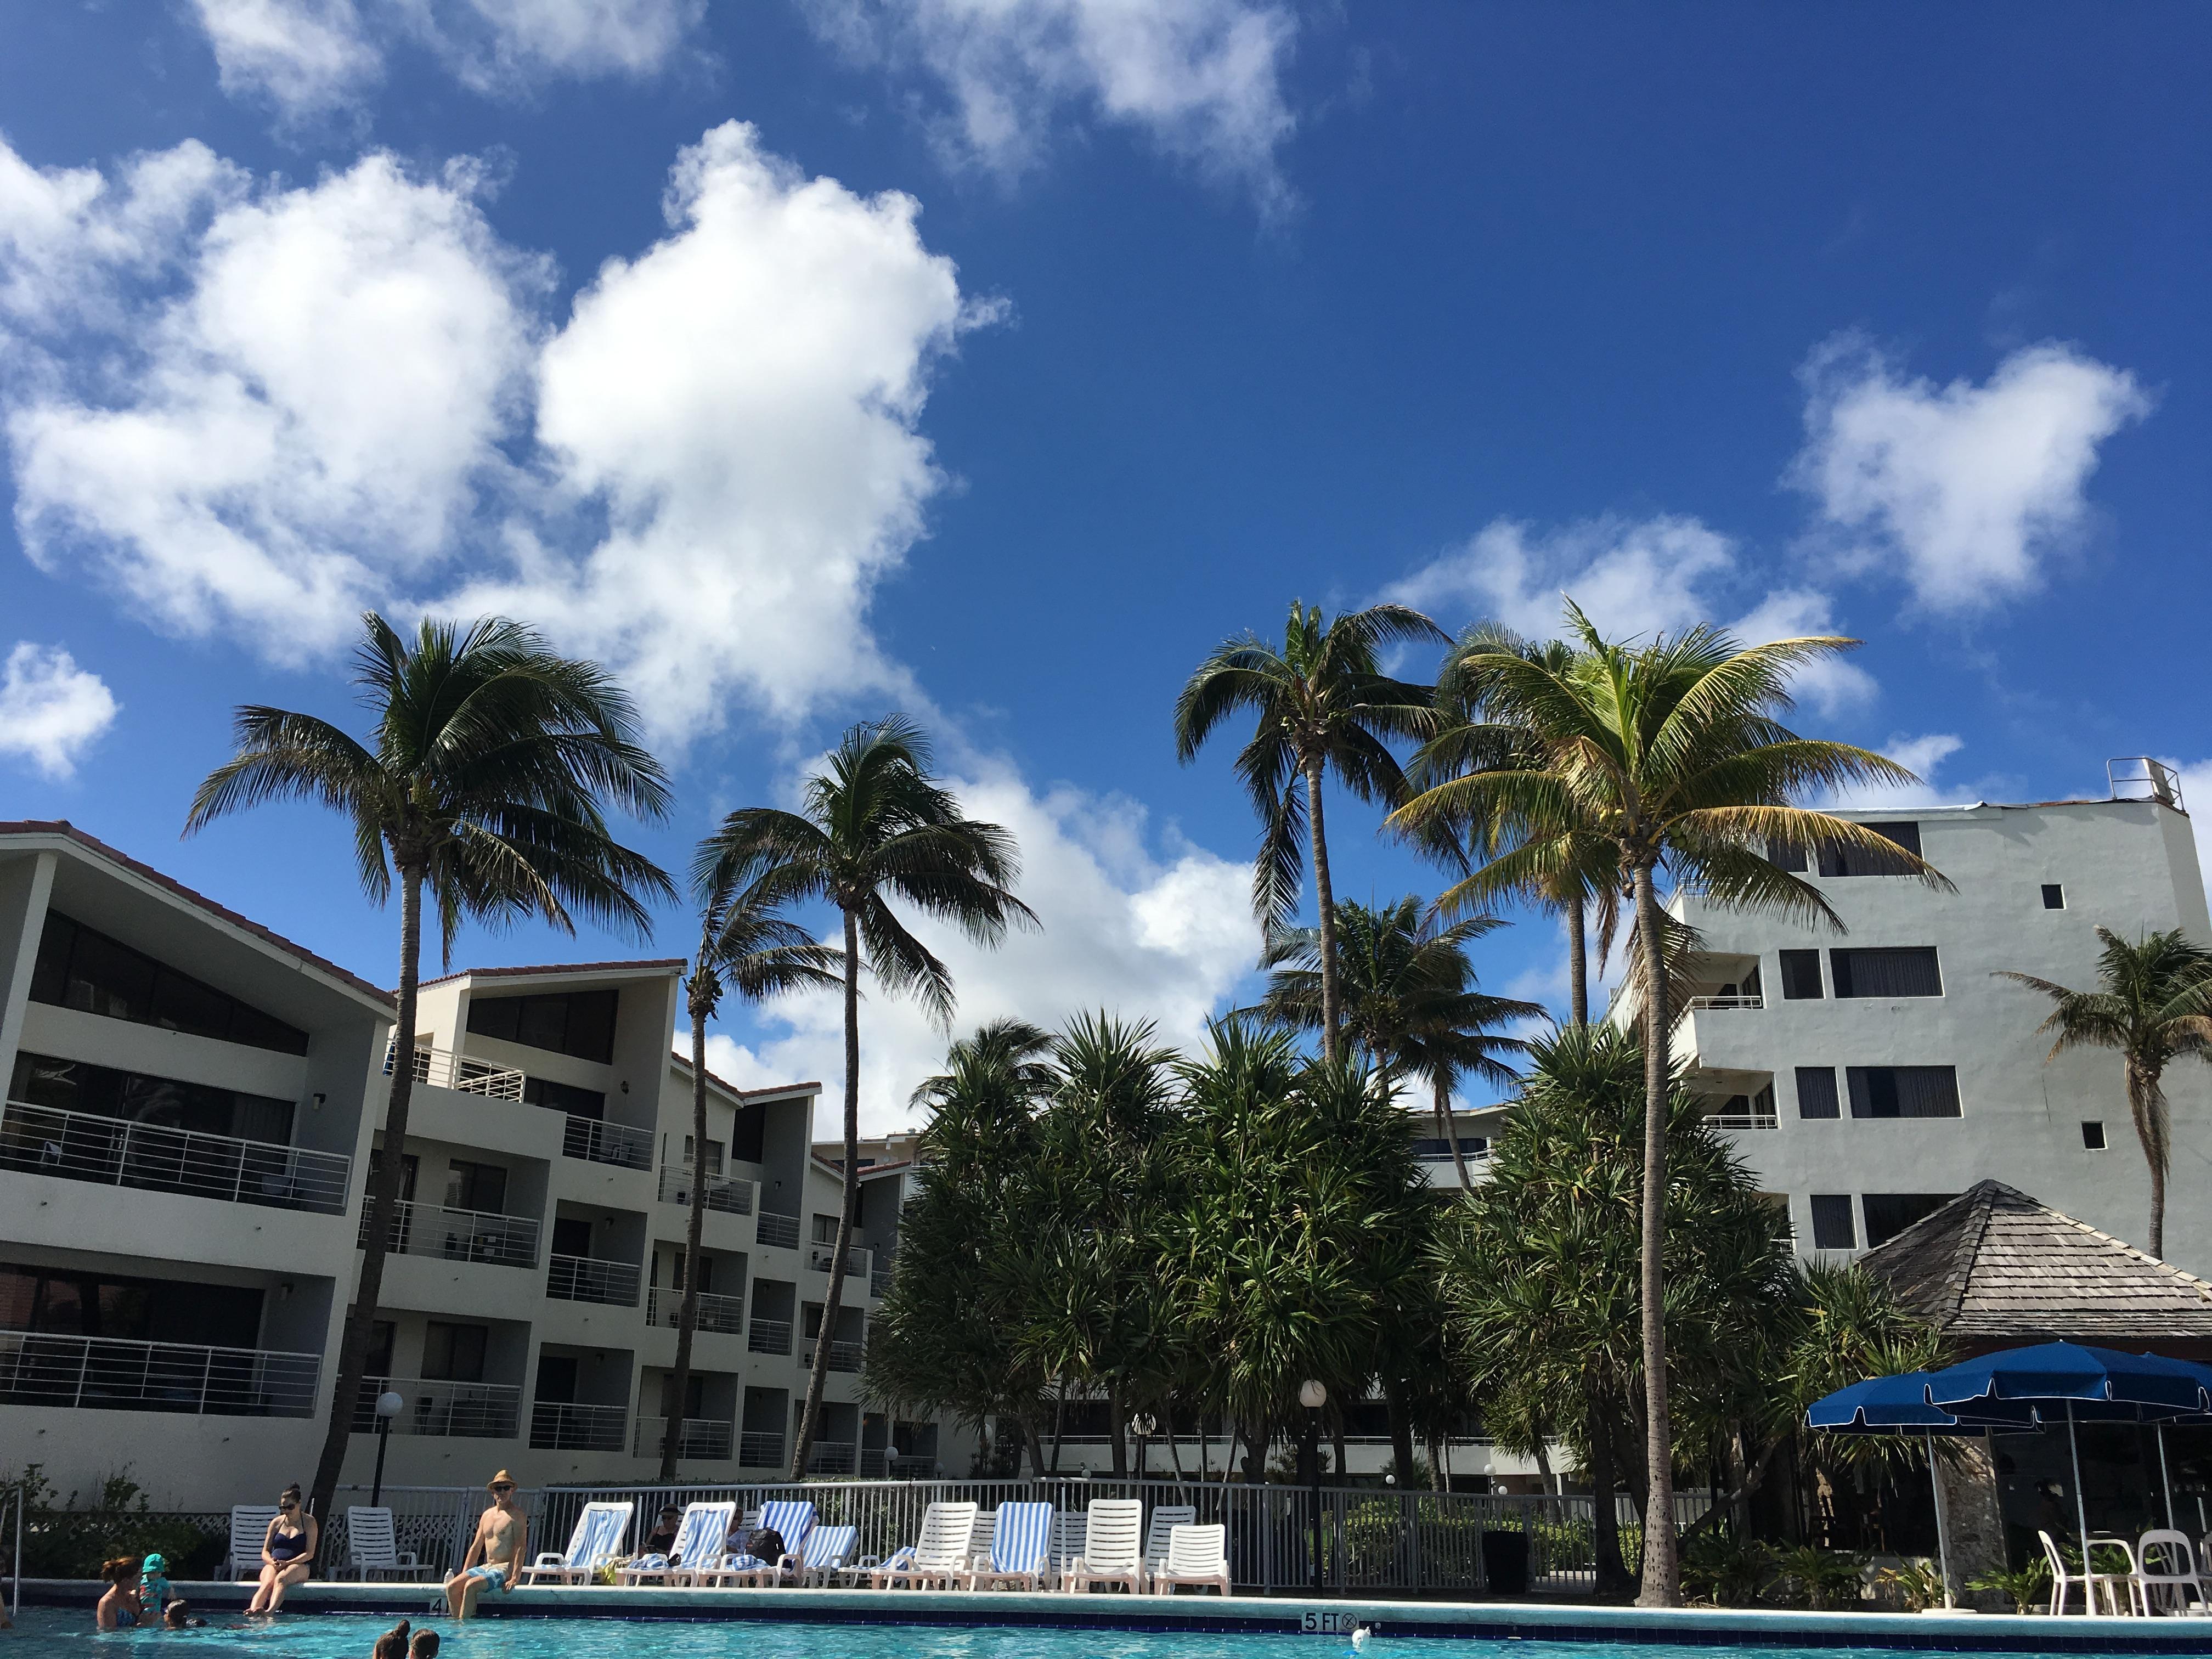 Pool view ❤️